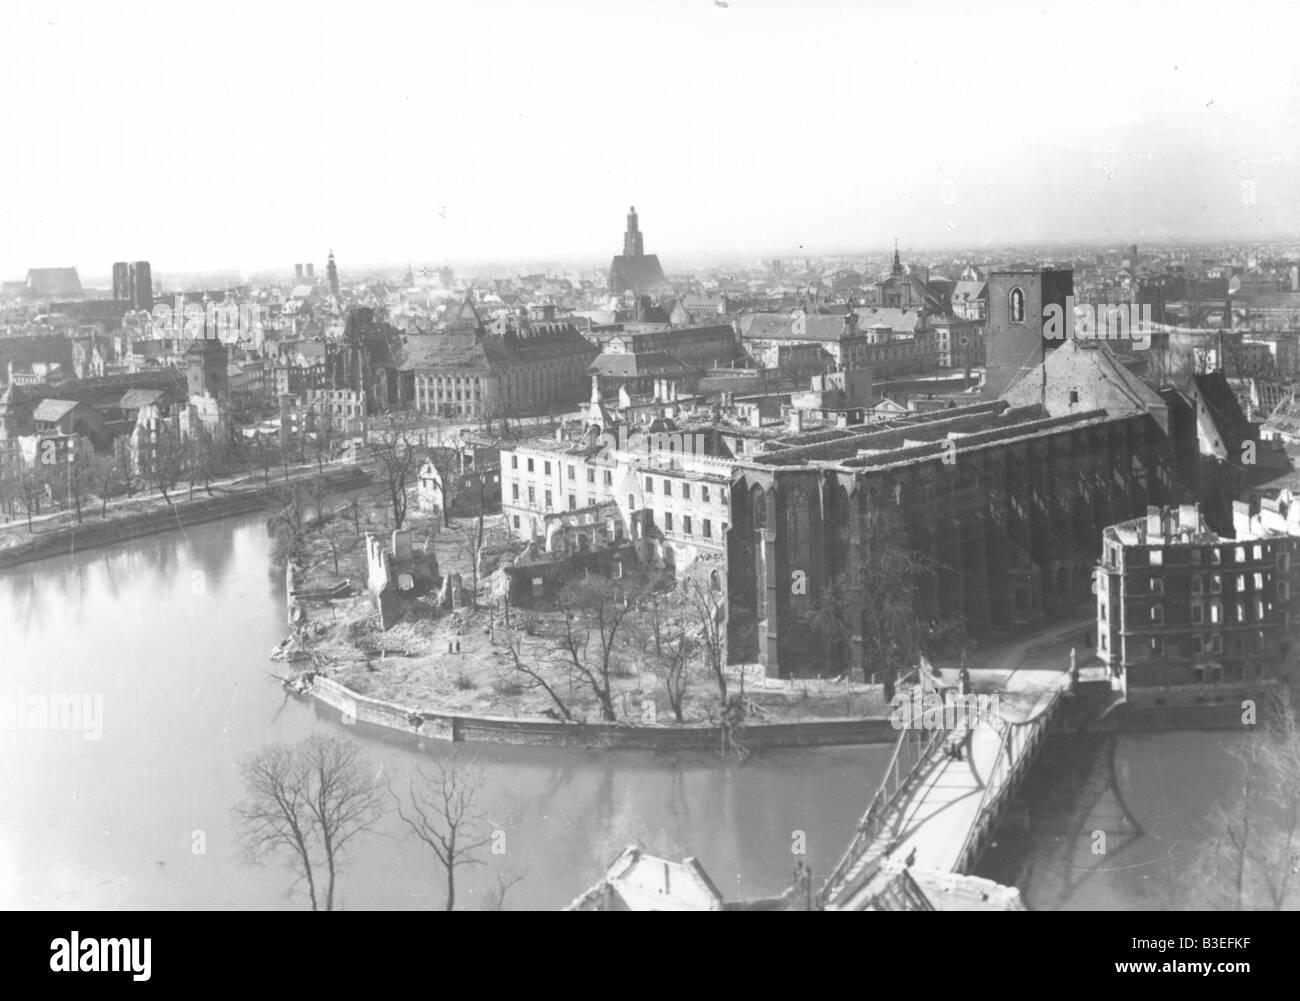 https://c8.alamy.com/compde/b3efkf/breslau-sandkirche-foto-1945-b3efkf.jpg